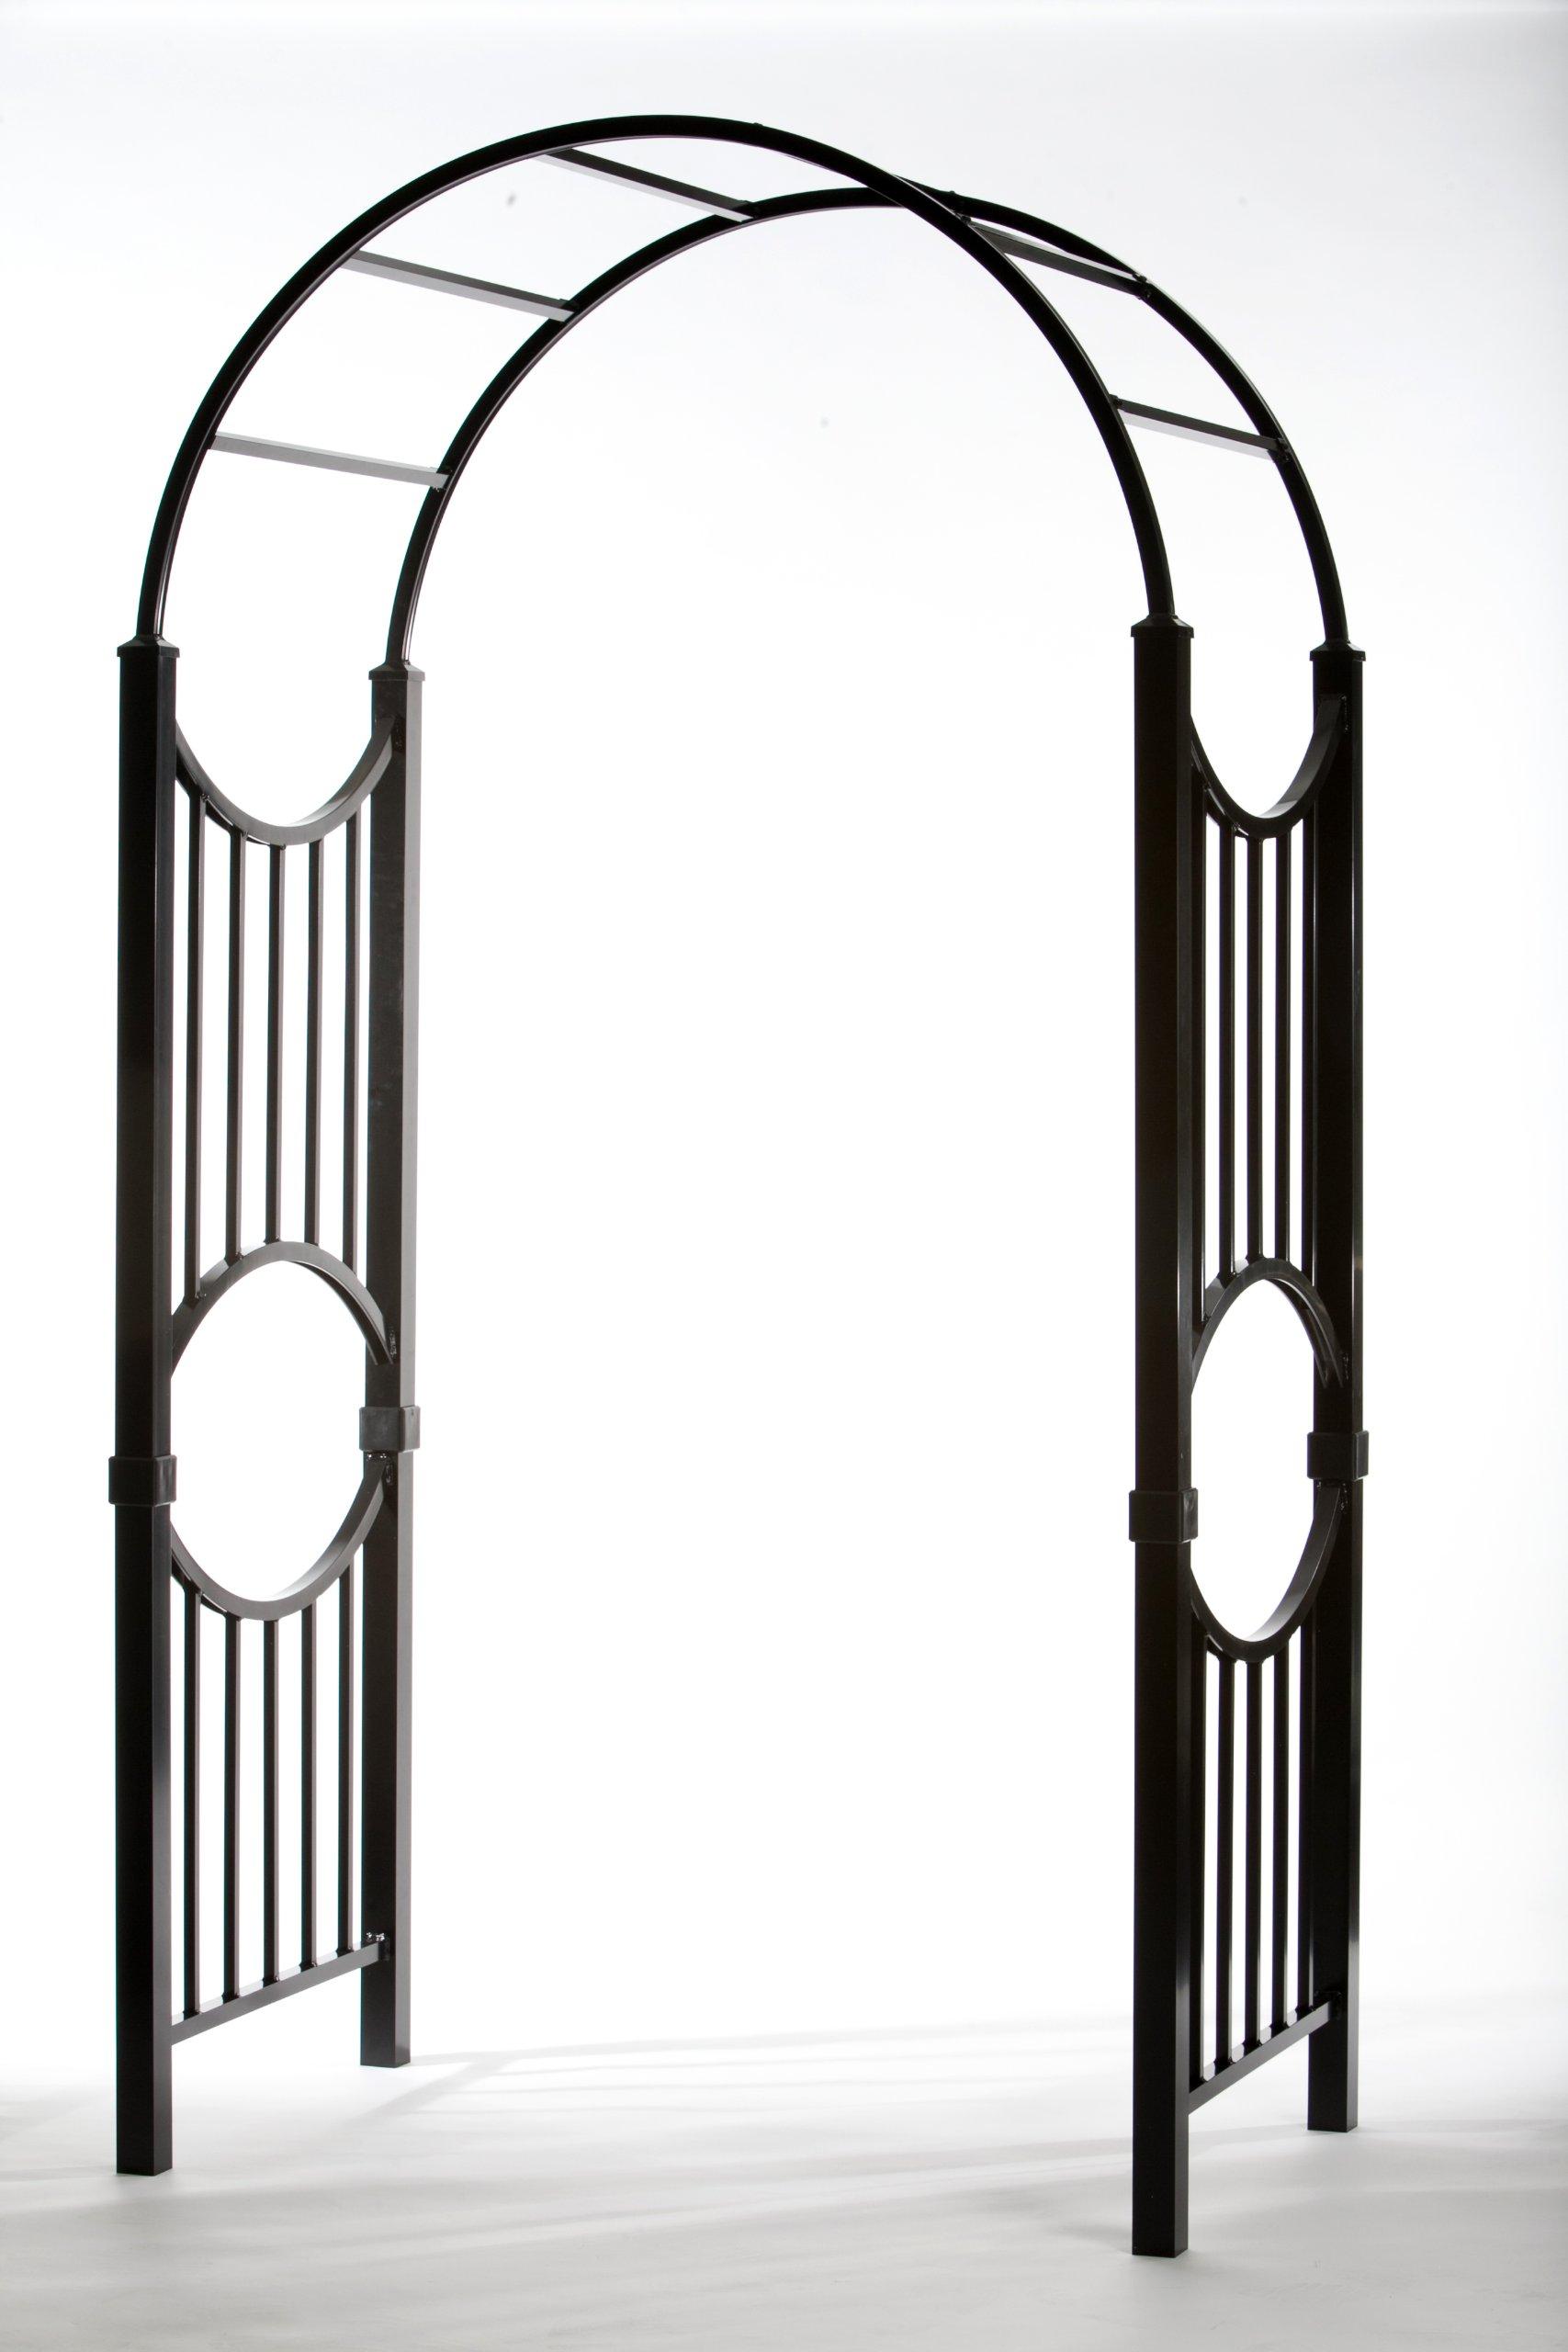 Specrail Manchester ARBORSPEC2BL Aluminum Garden Arbor Kit, 96 by 47 by 38-Inch, Black